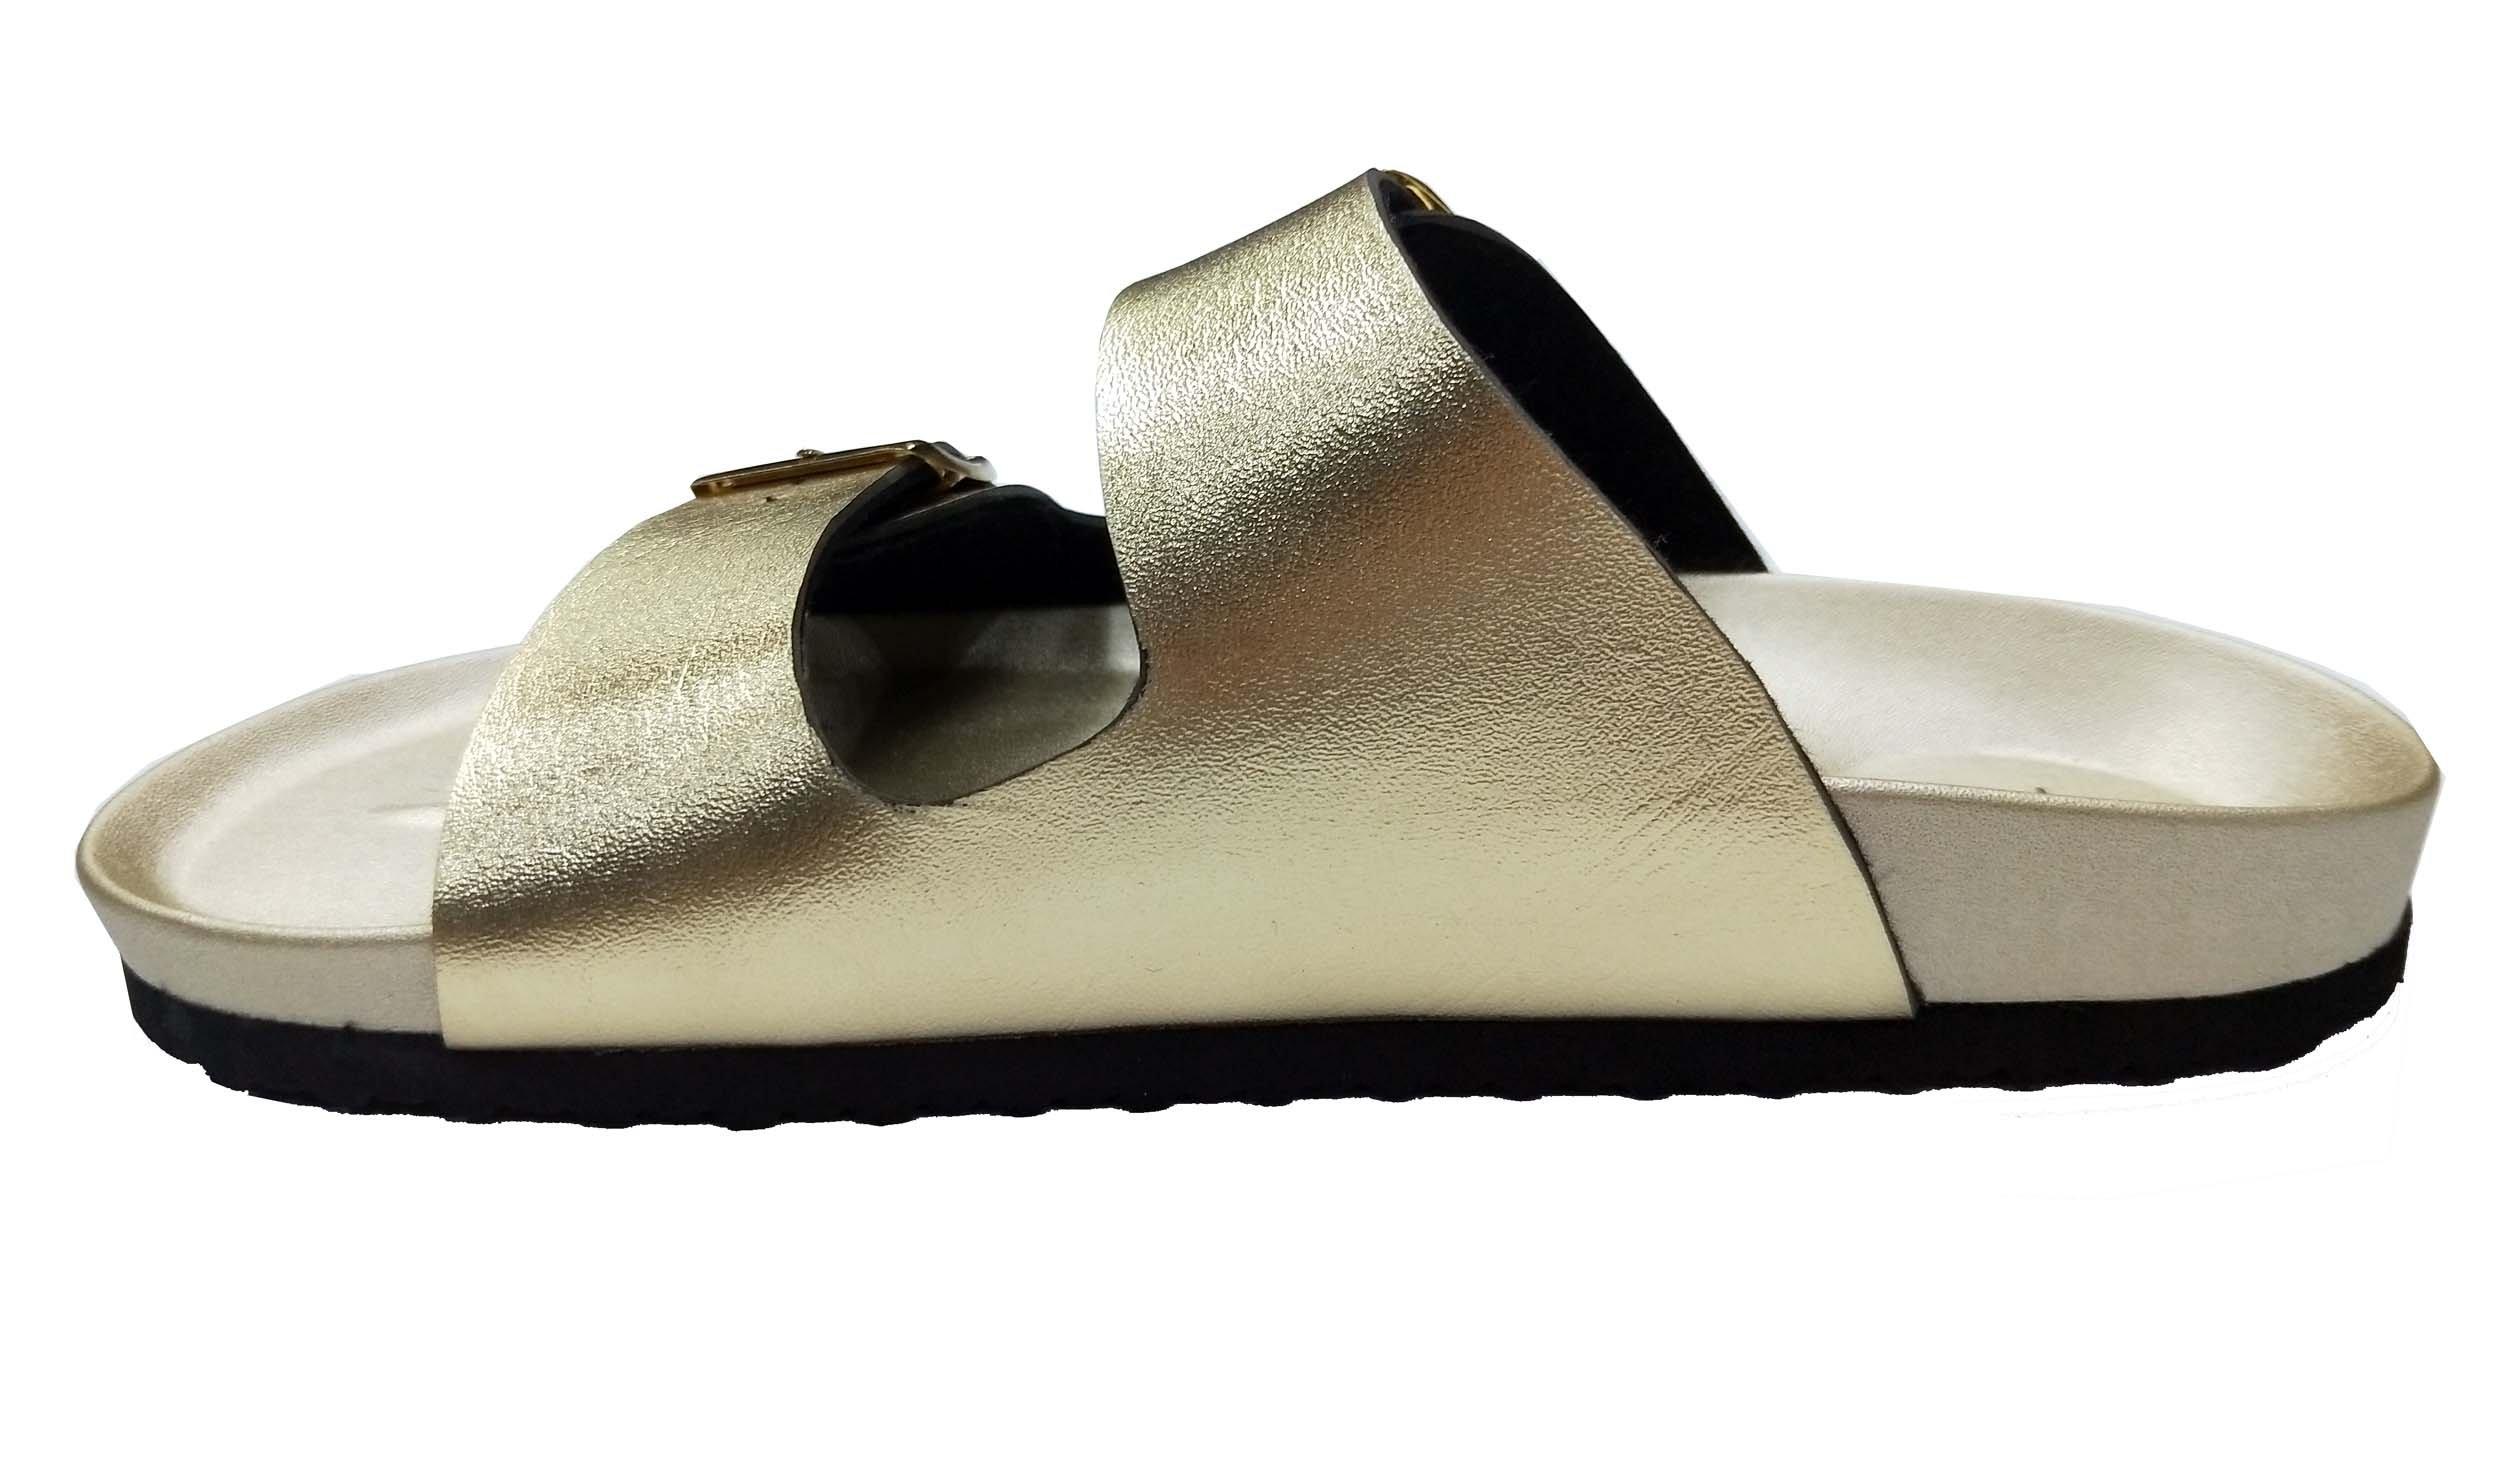 Pepstep Buckle Strap Sandals for Women Super Lightweight and Comfortable Golden/Black Womens Footbed Slide Sandals(9, Golden)